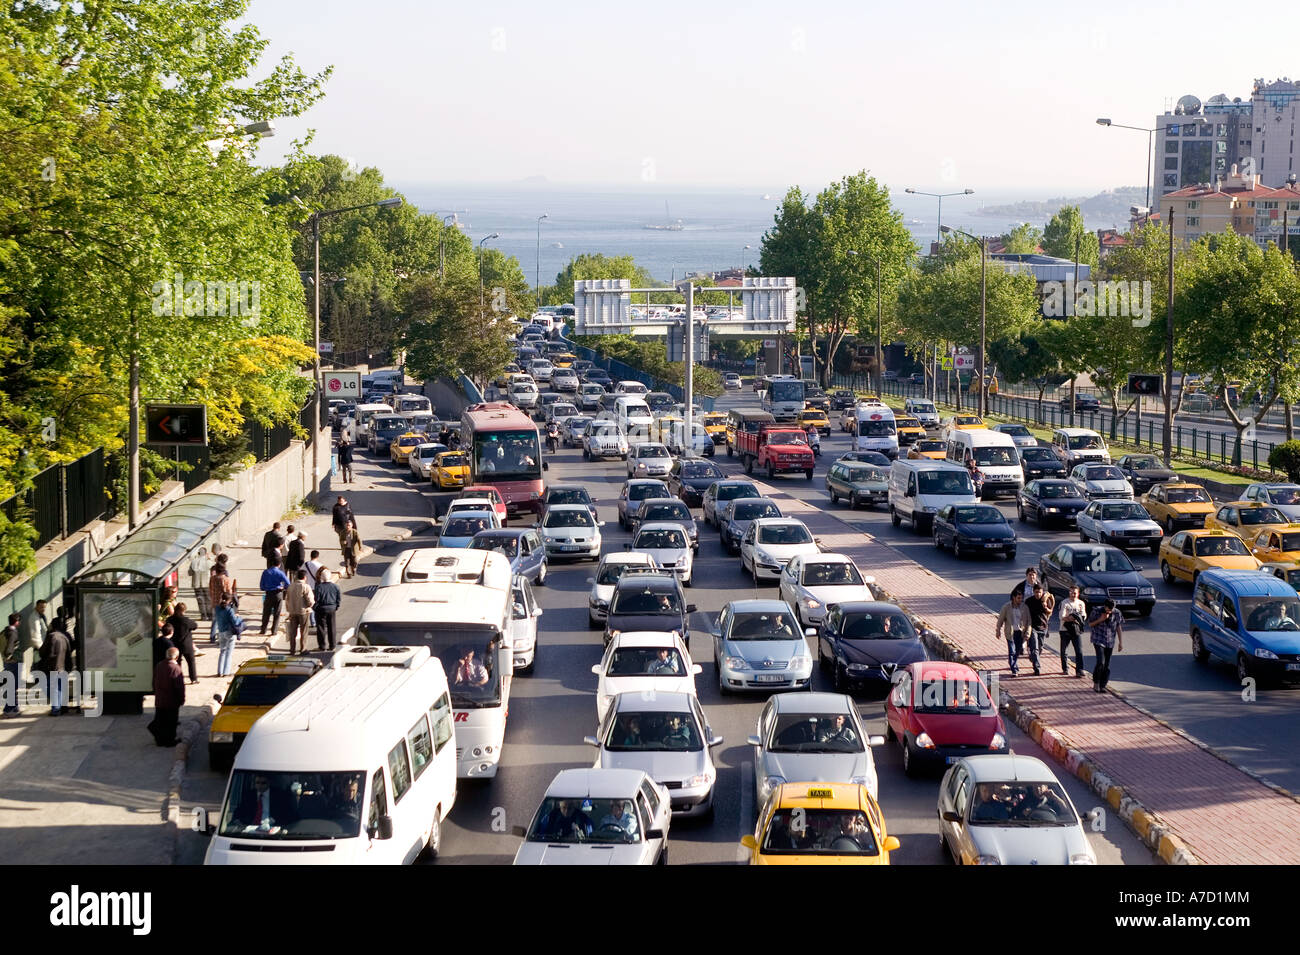 Schwerlastverkehr auf Istanbul City Road in Ortaköy Stockbild